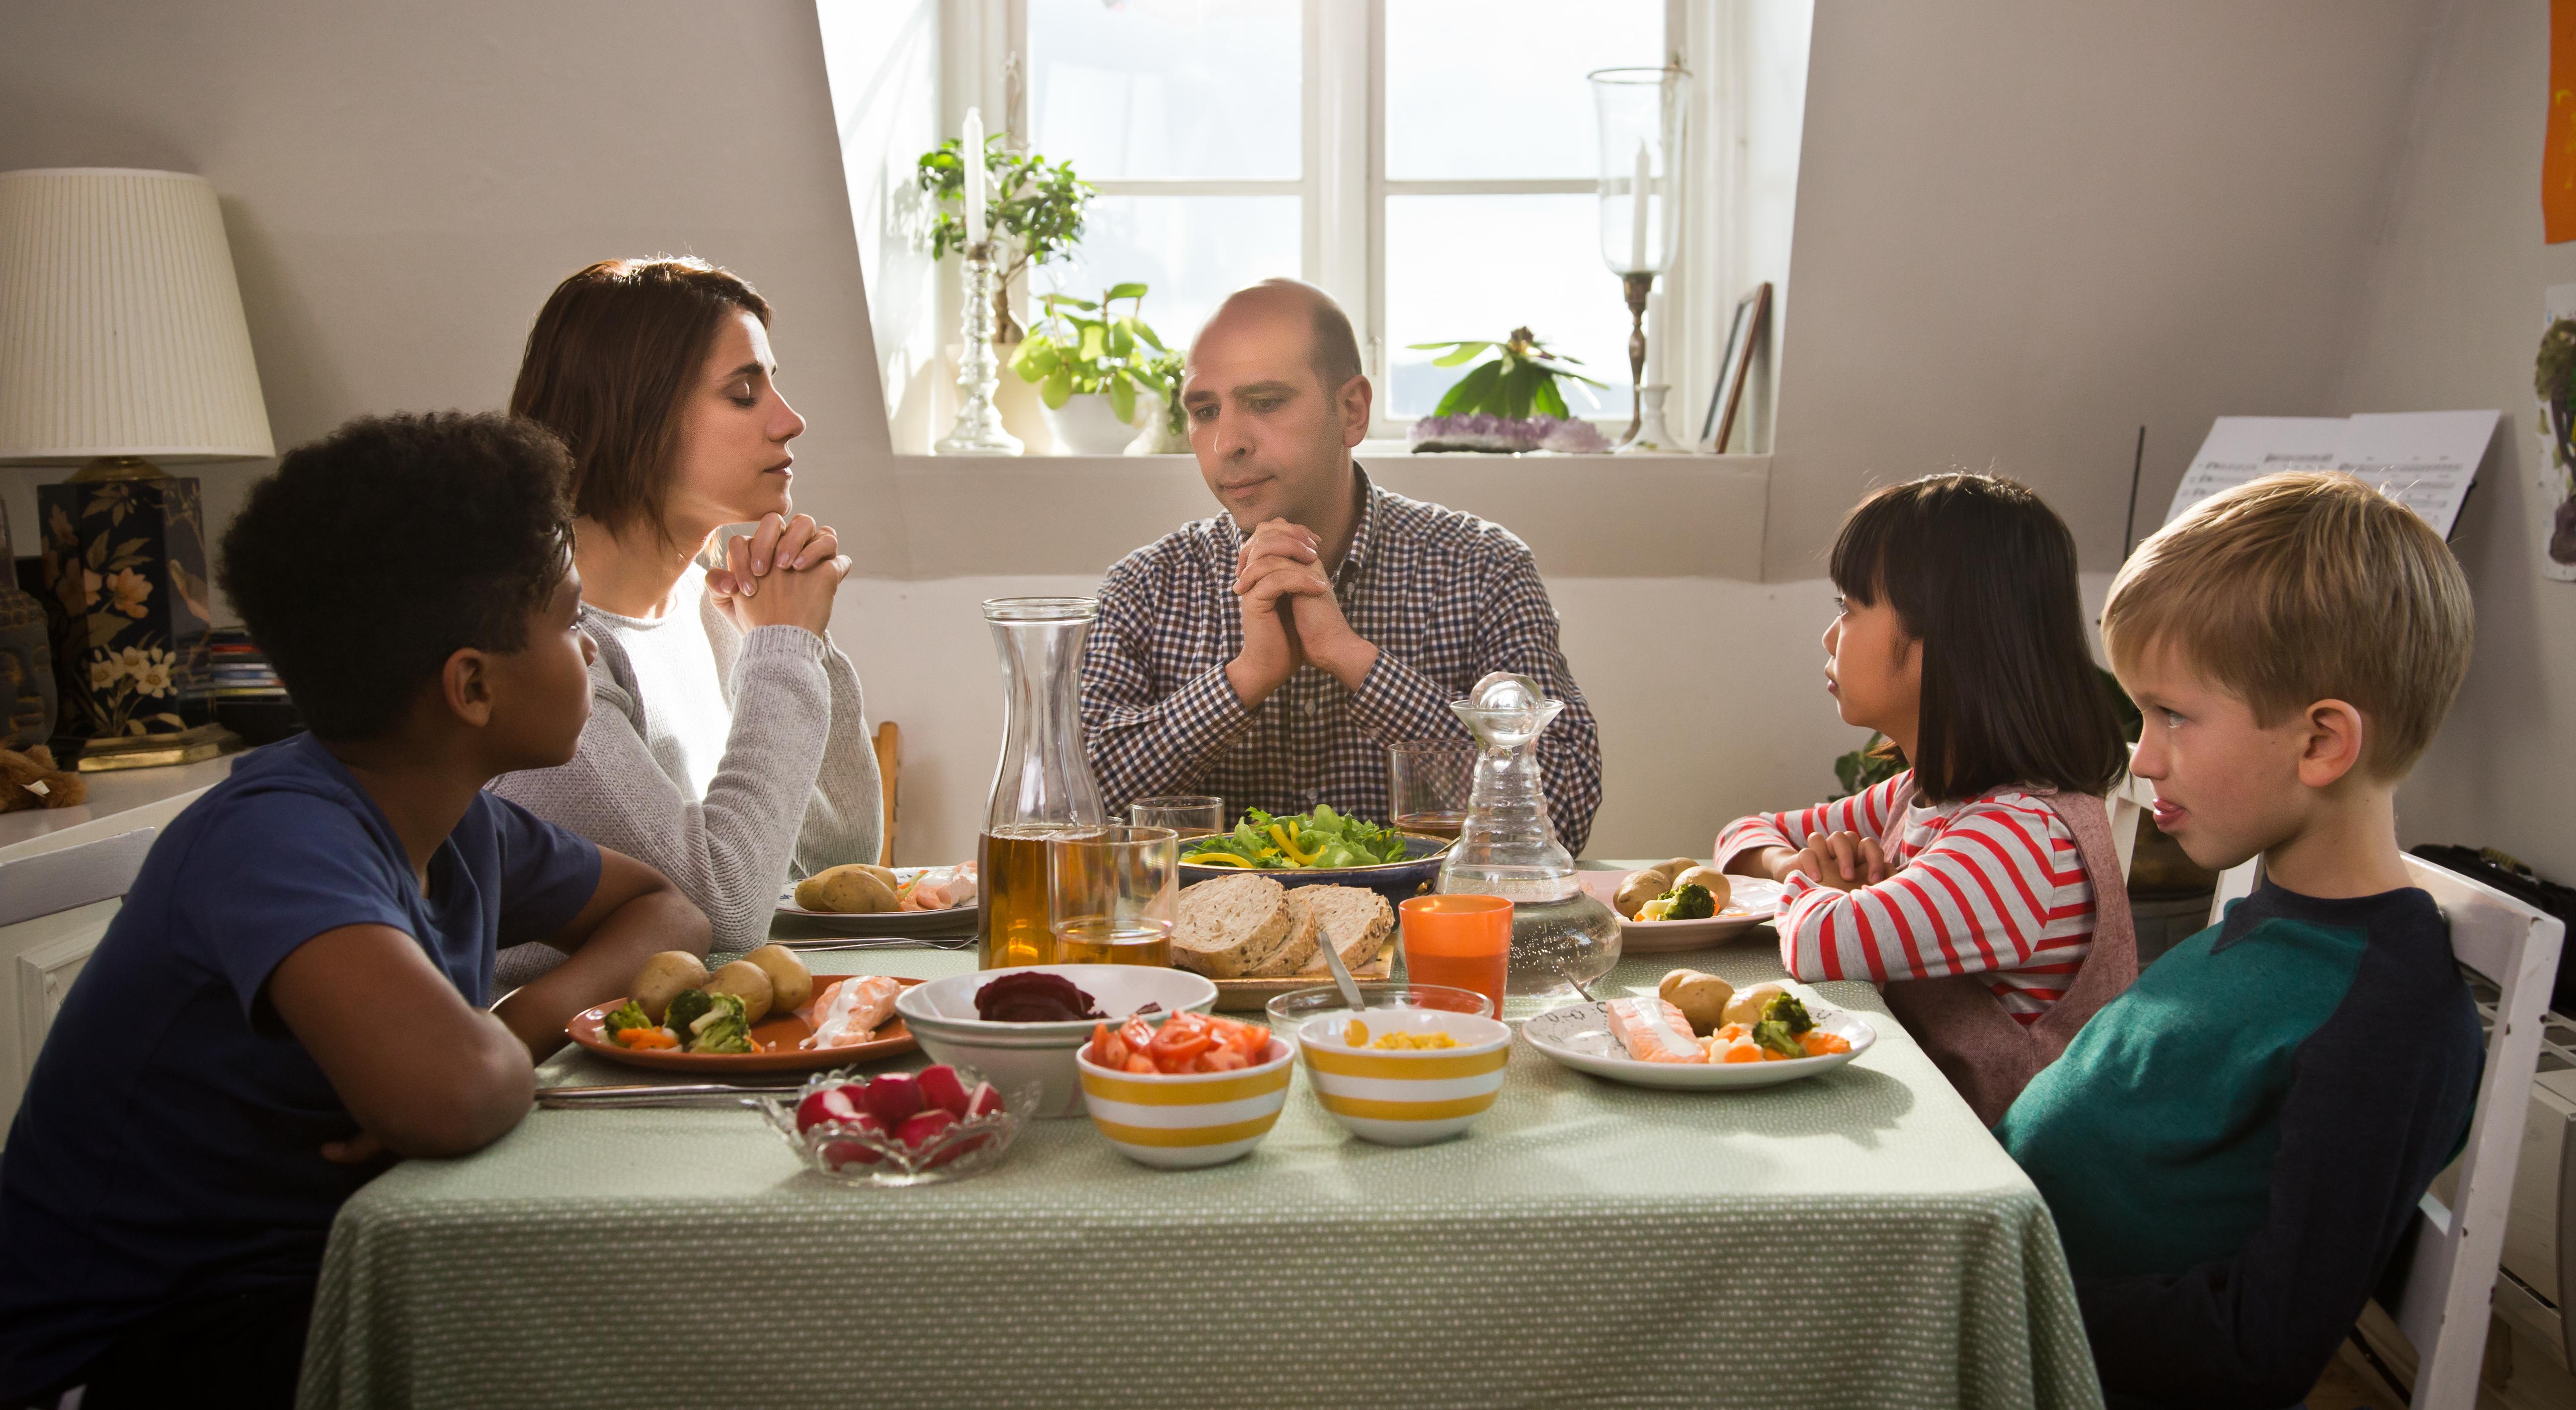 Zalone famiglia tavola @MaurizioRaspante